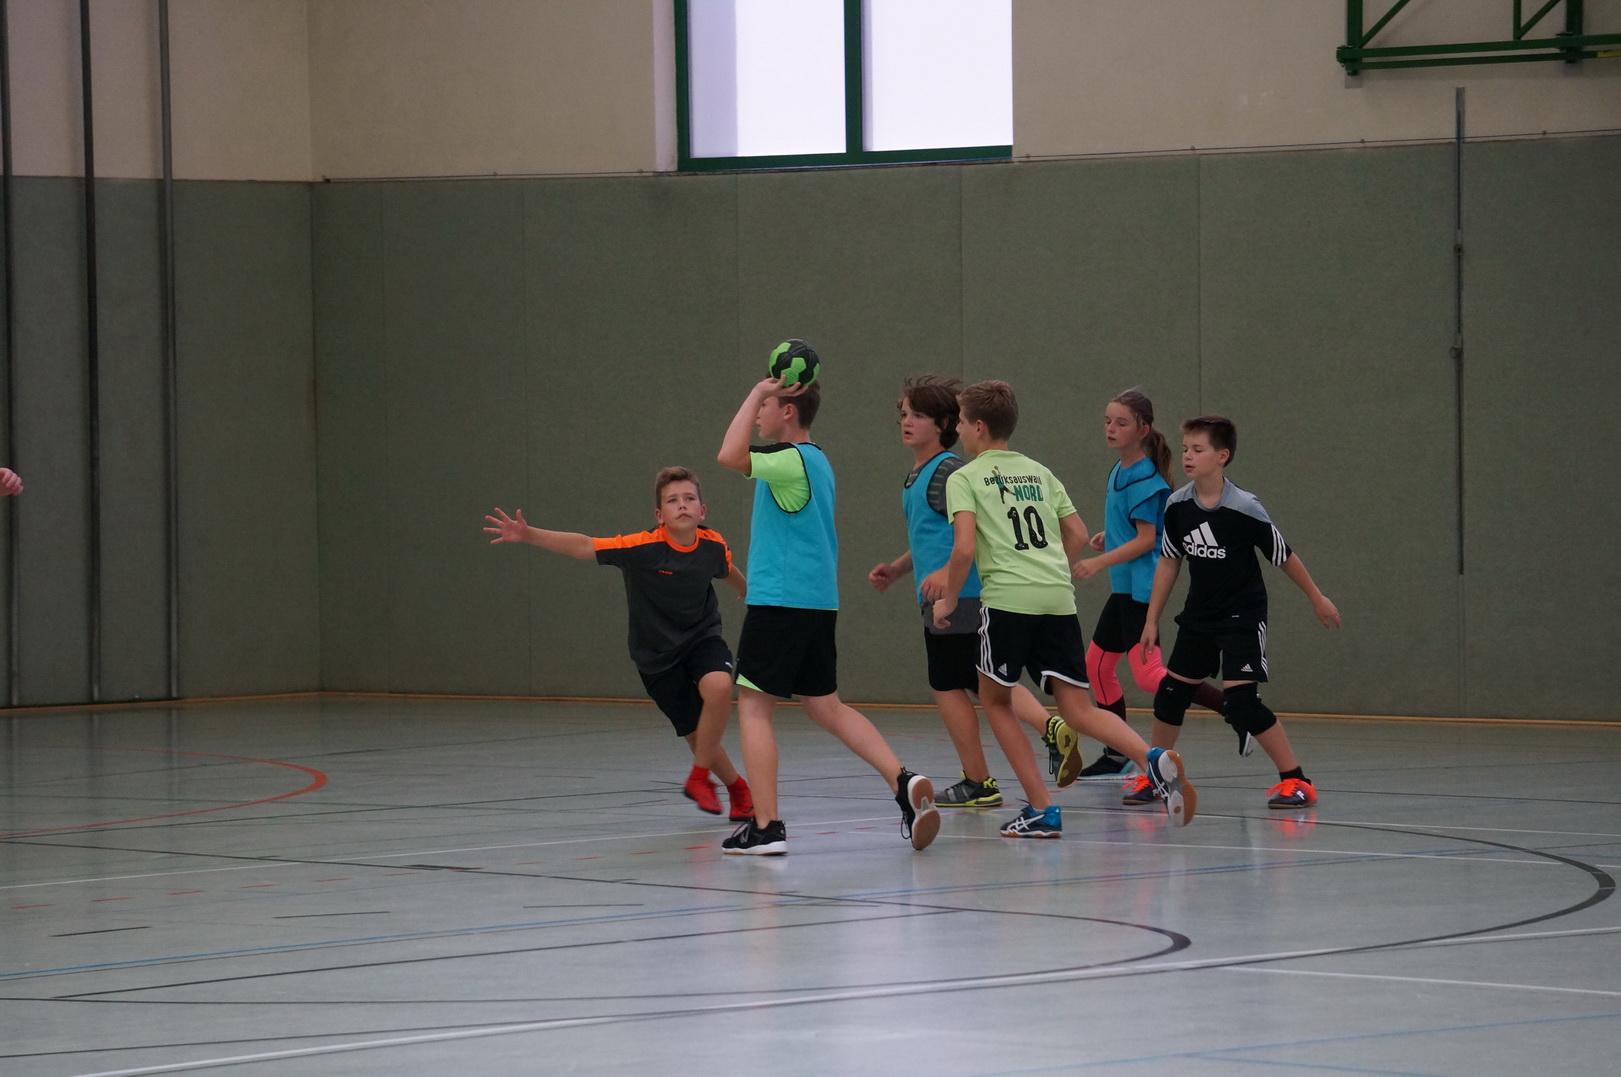 201808_Handballcamp_SDH_MG_102w